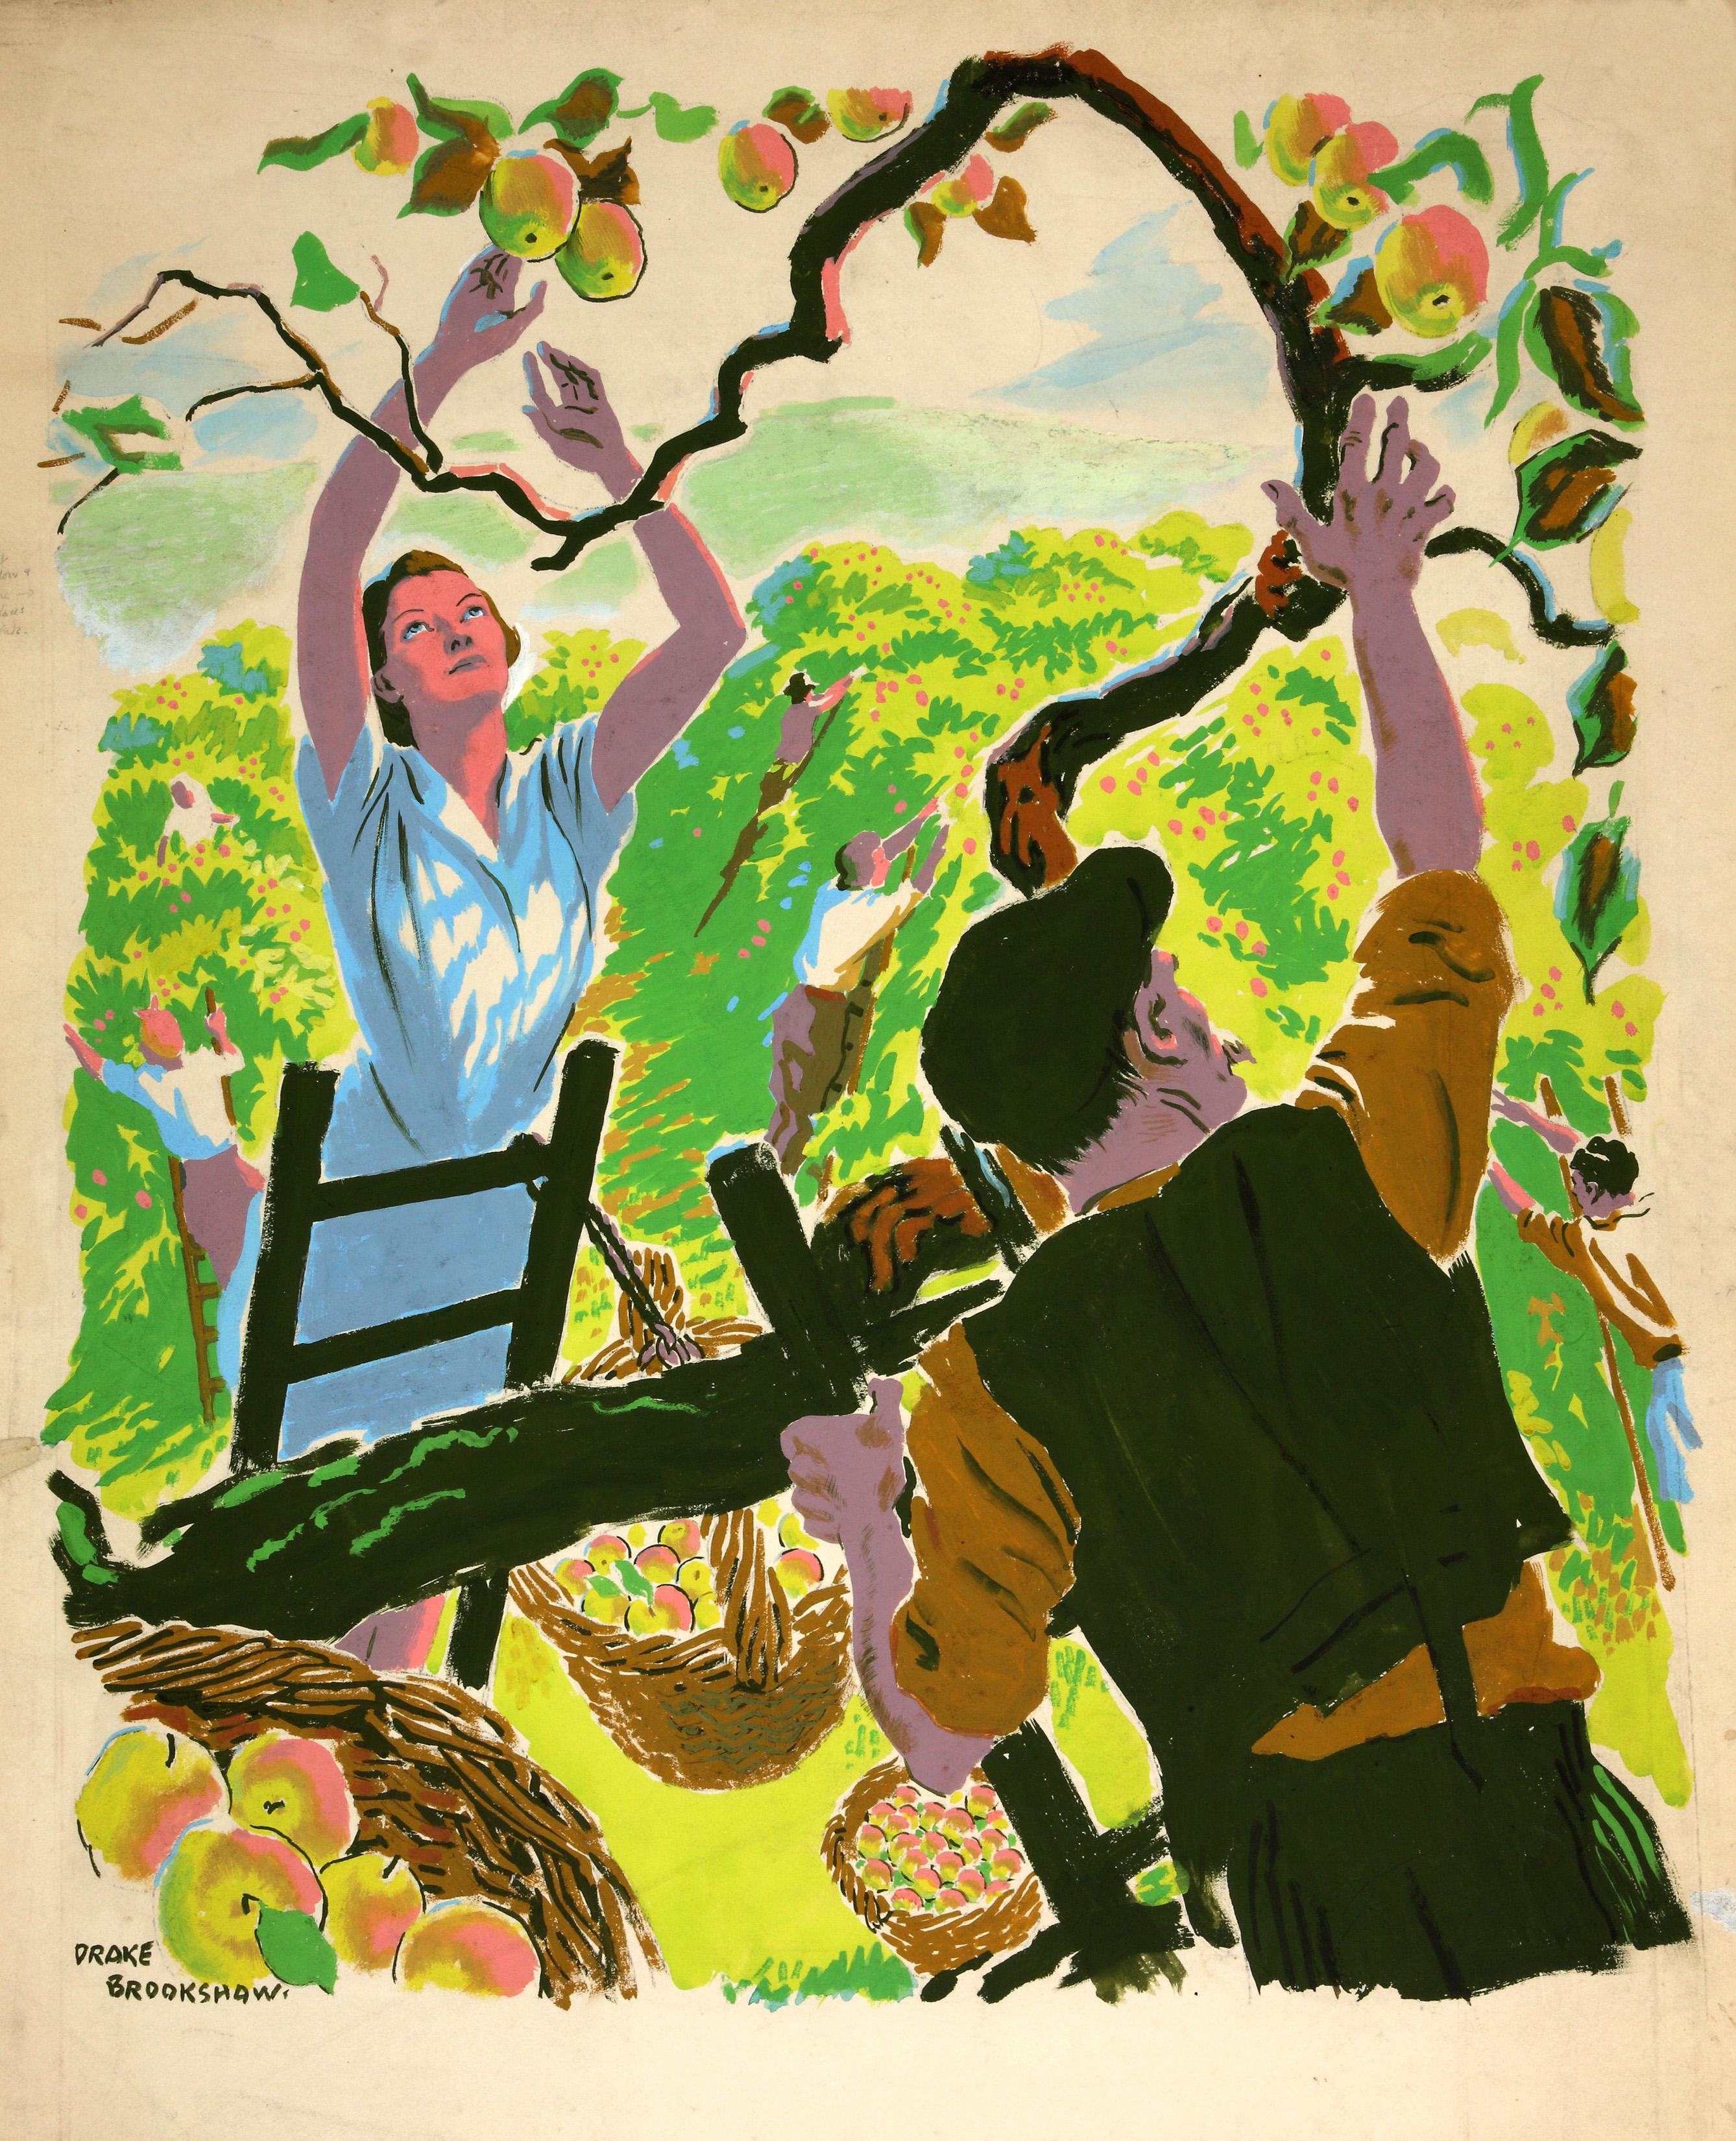 INF3-109_Food_Production_Apple_picking_Artist_Drake_Brookshaw